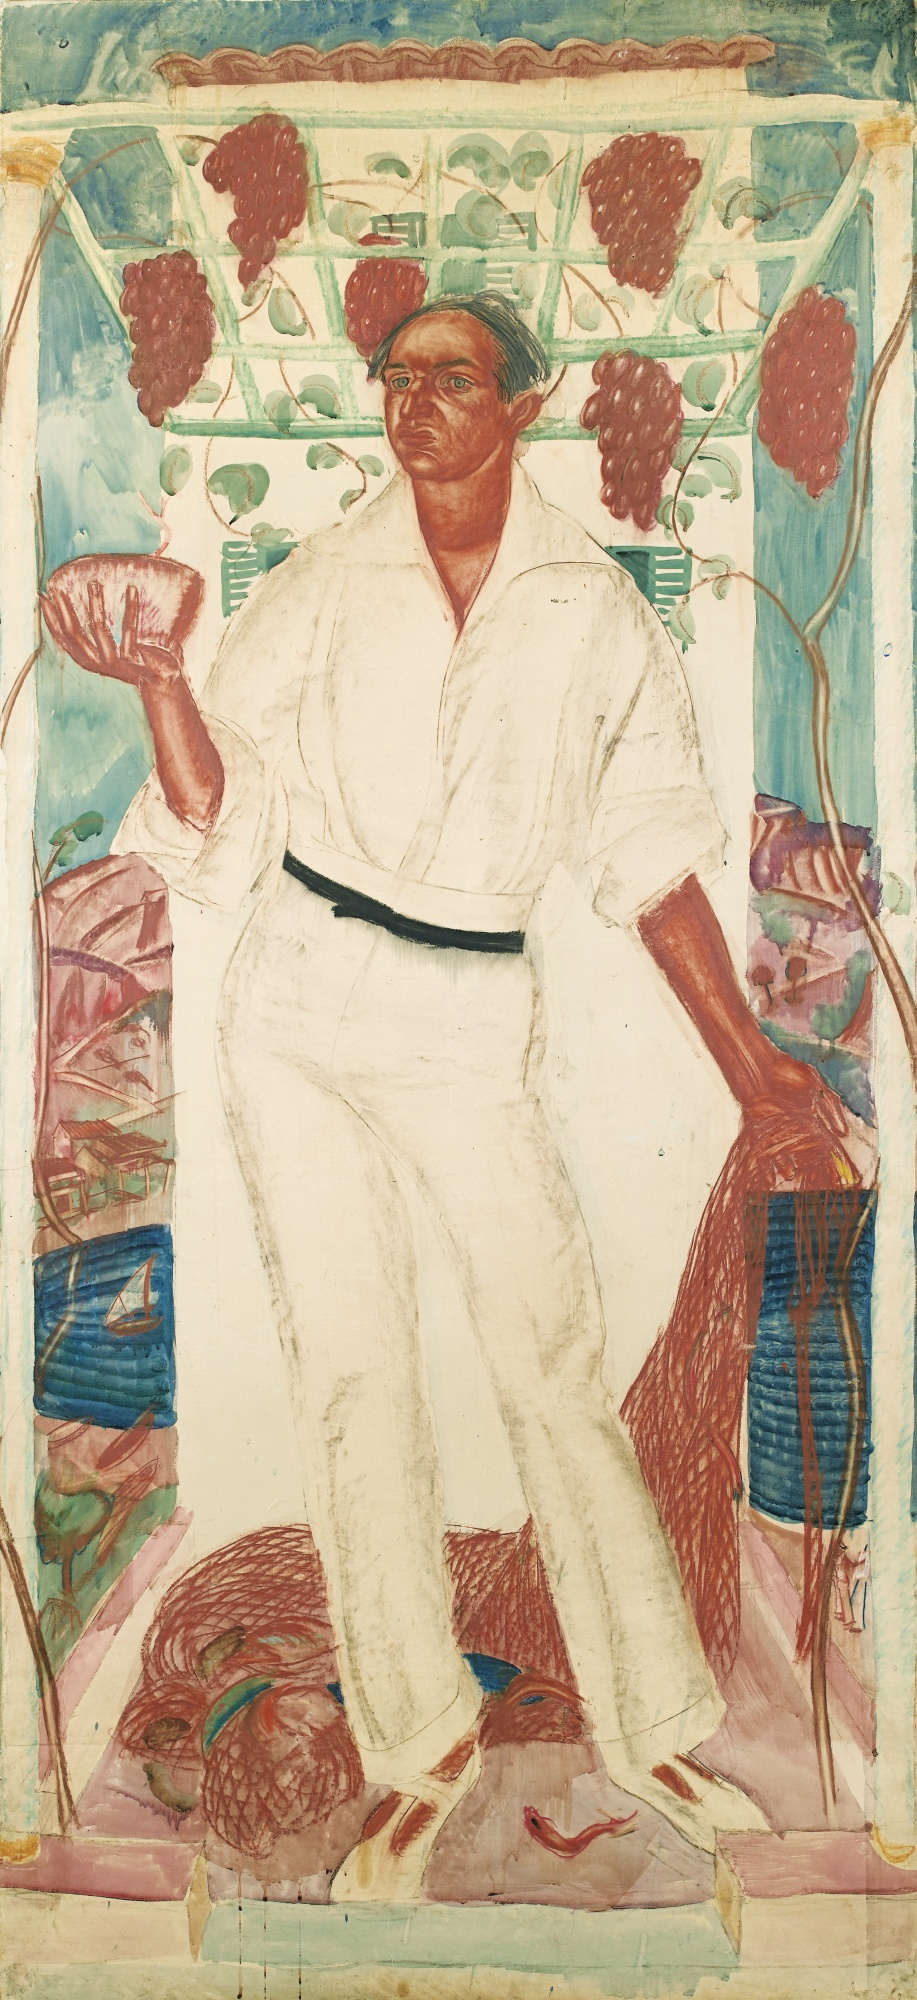 Alexander Yakovlev. Portrait of Roberto Montenegro. 1915